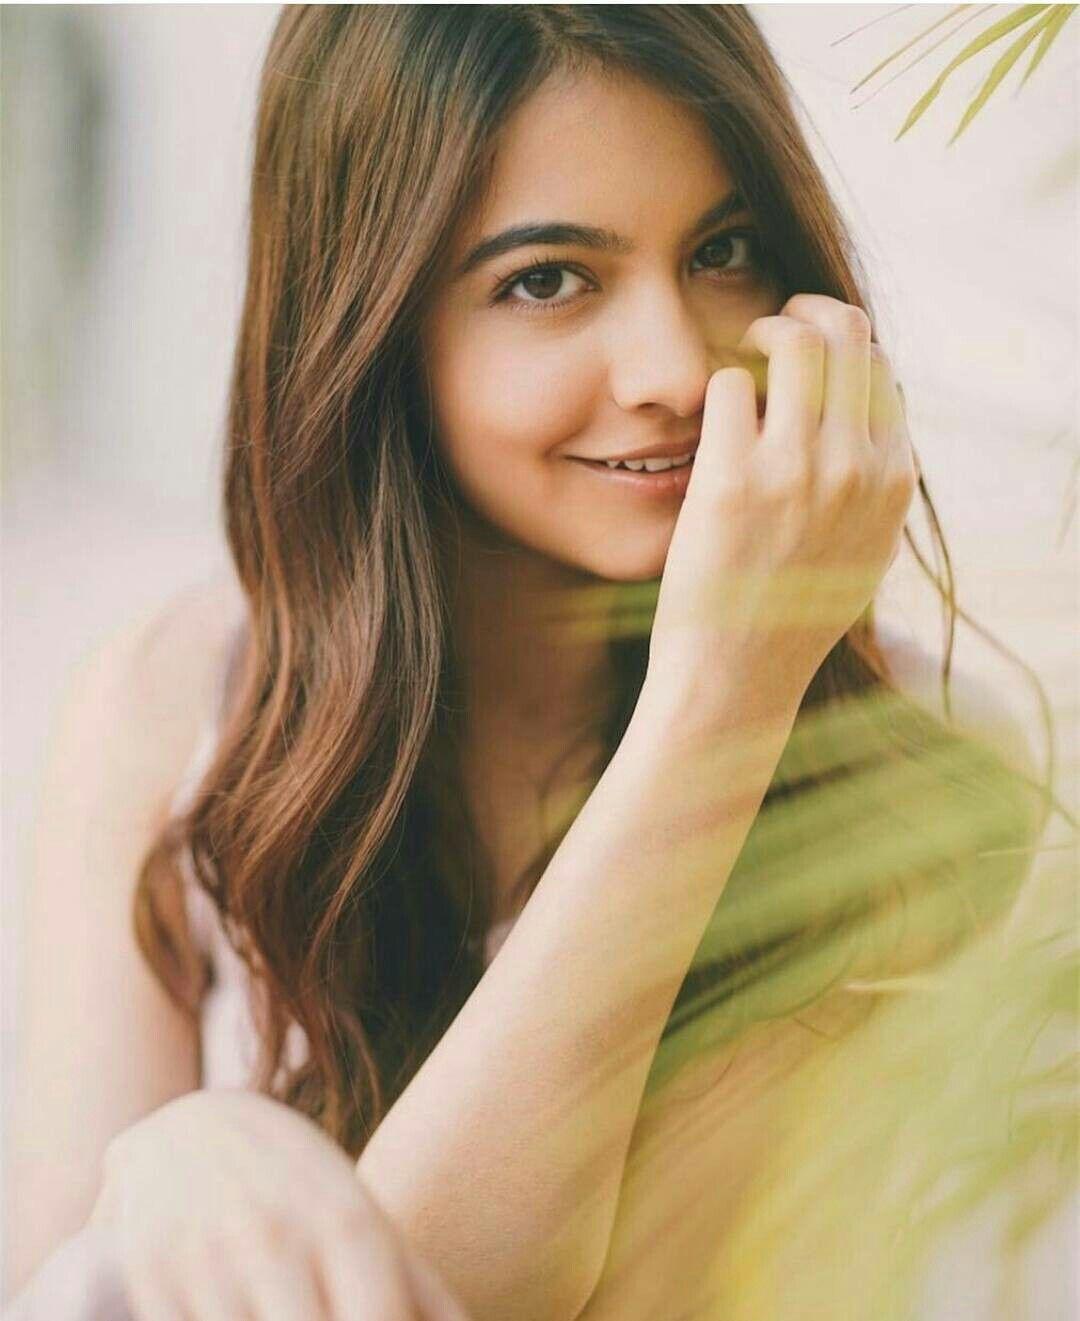 Sexy Anandita Pagnis  Indian Teen Actresses In 2019  Beautiful Indian Actress -3041